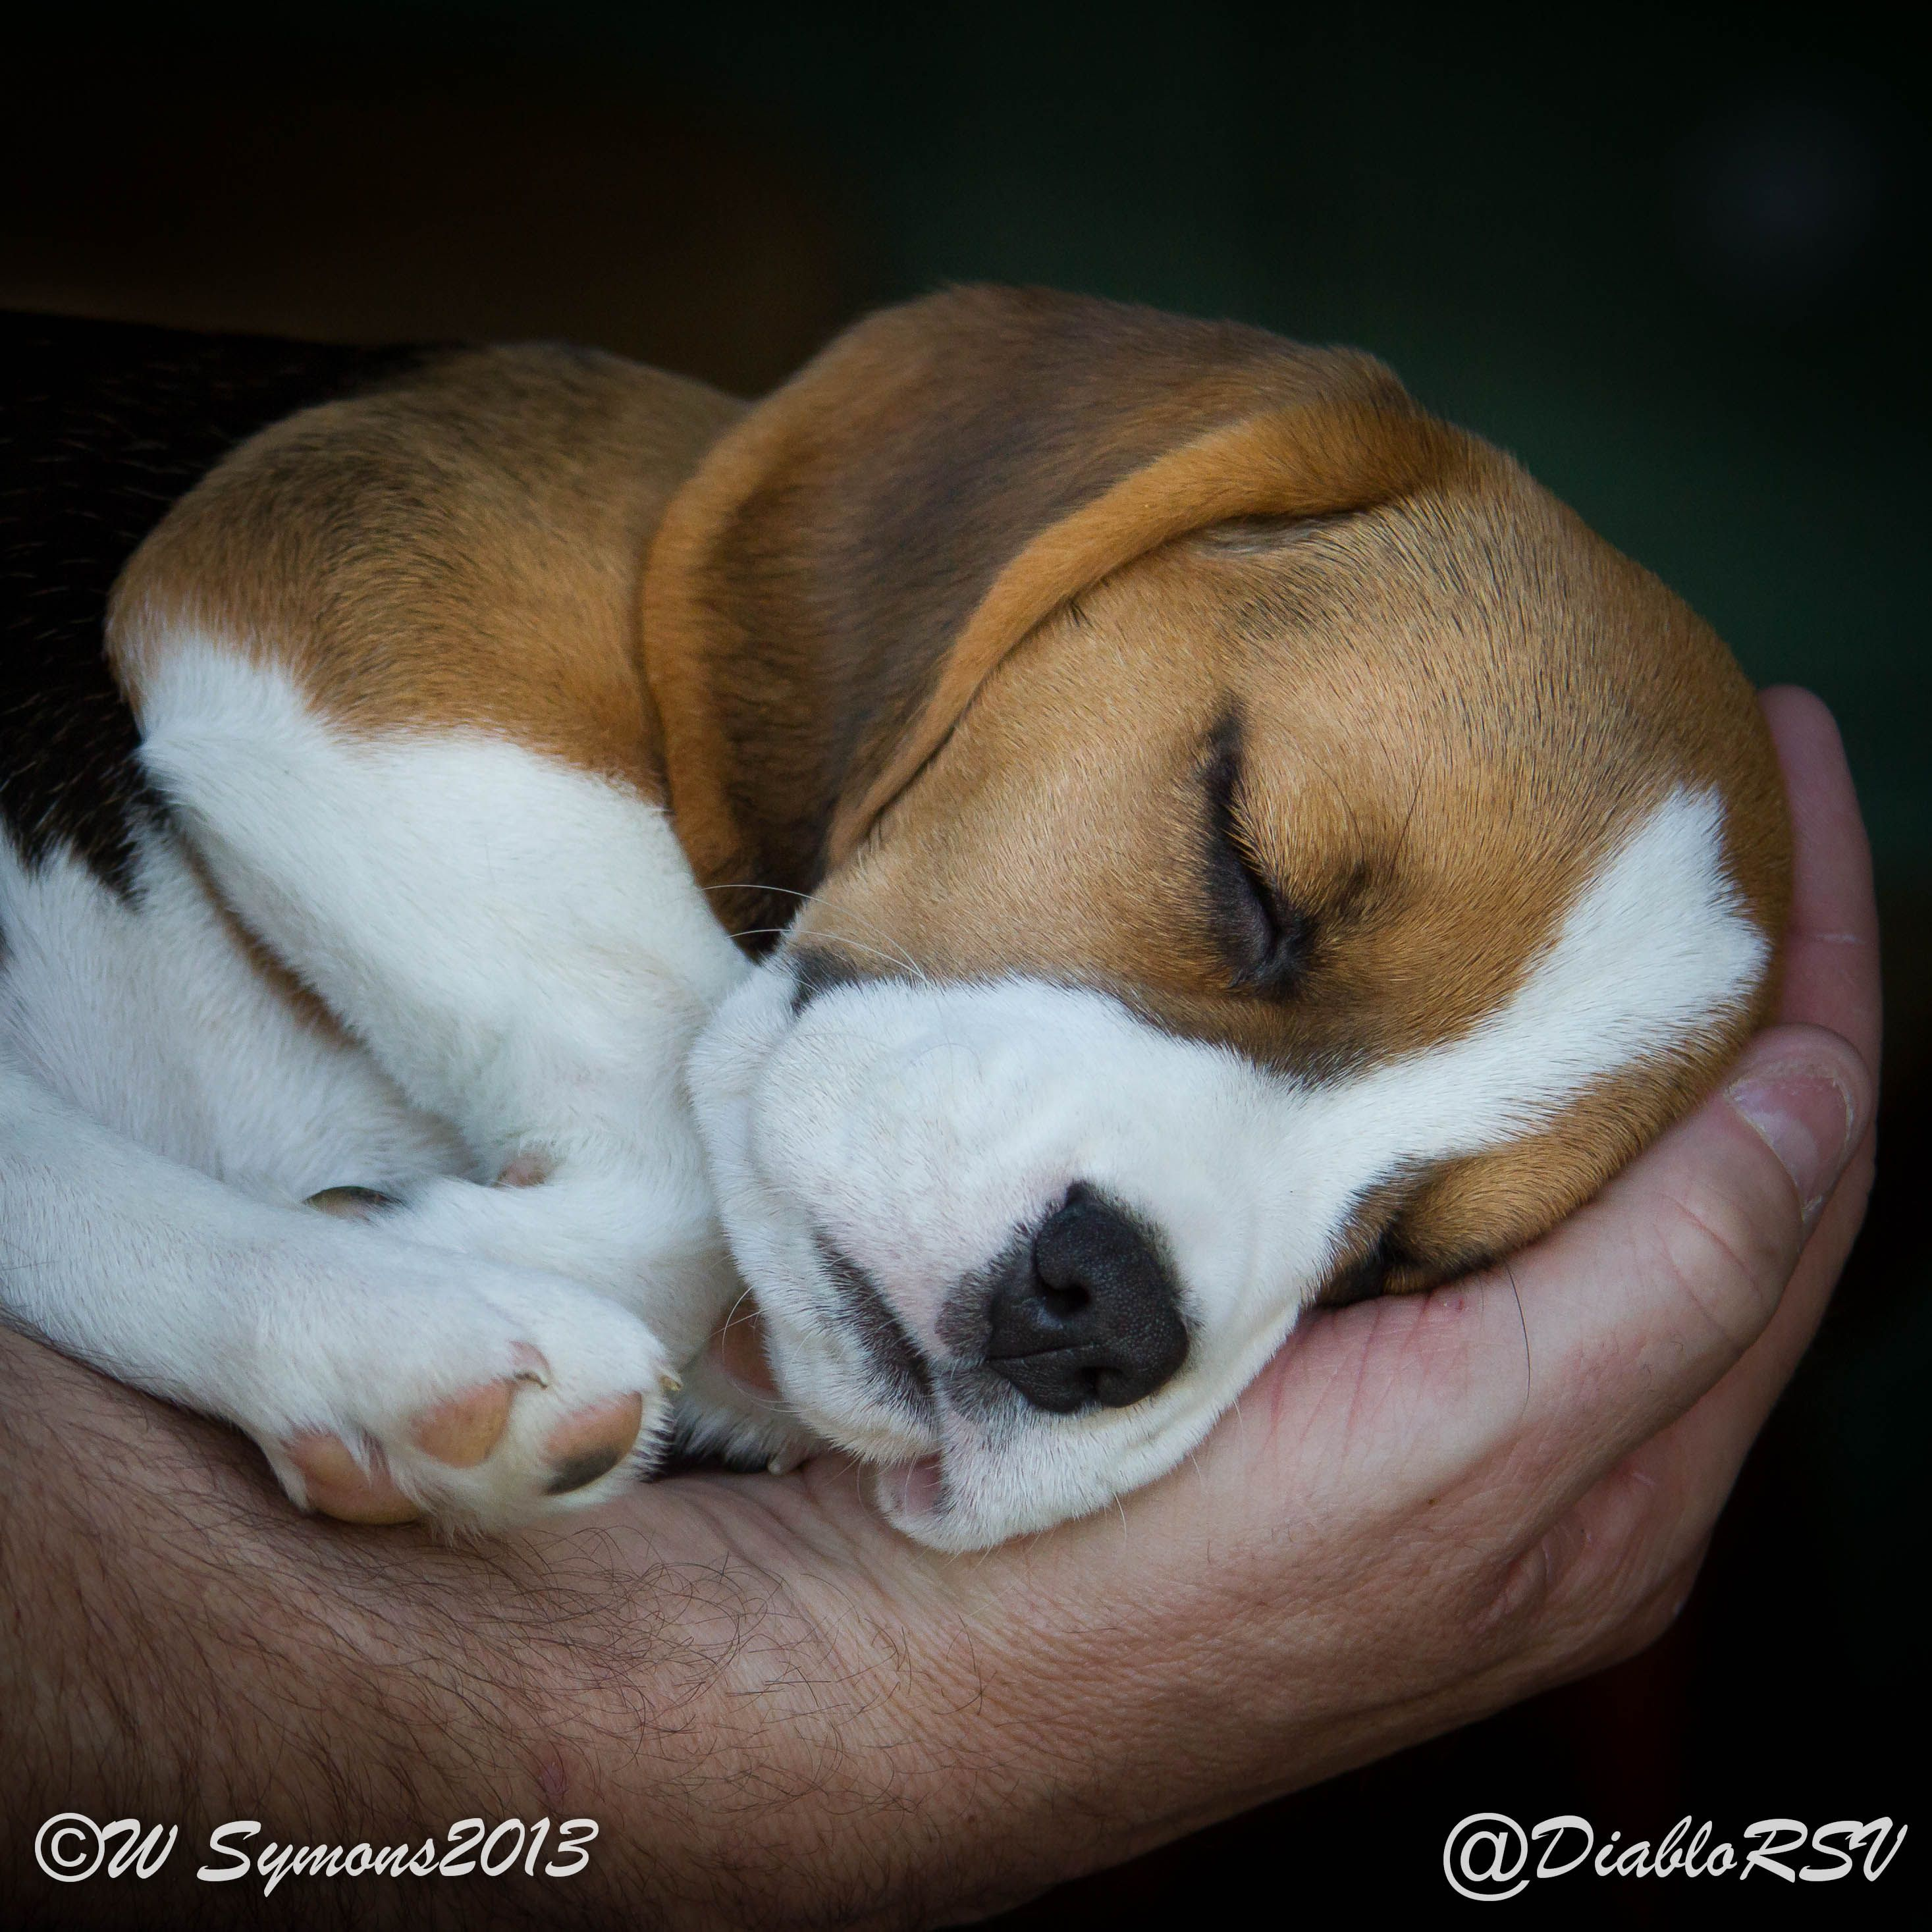 Cute beagle puppy beagles pinterest cute beagle puppy voltagebd Gallery